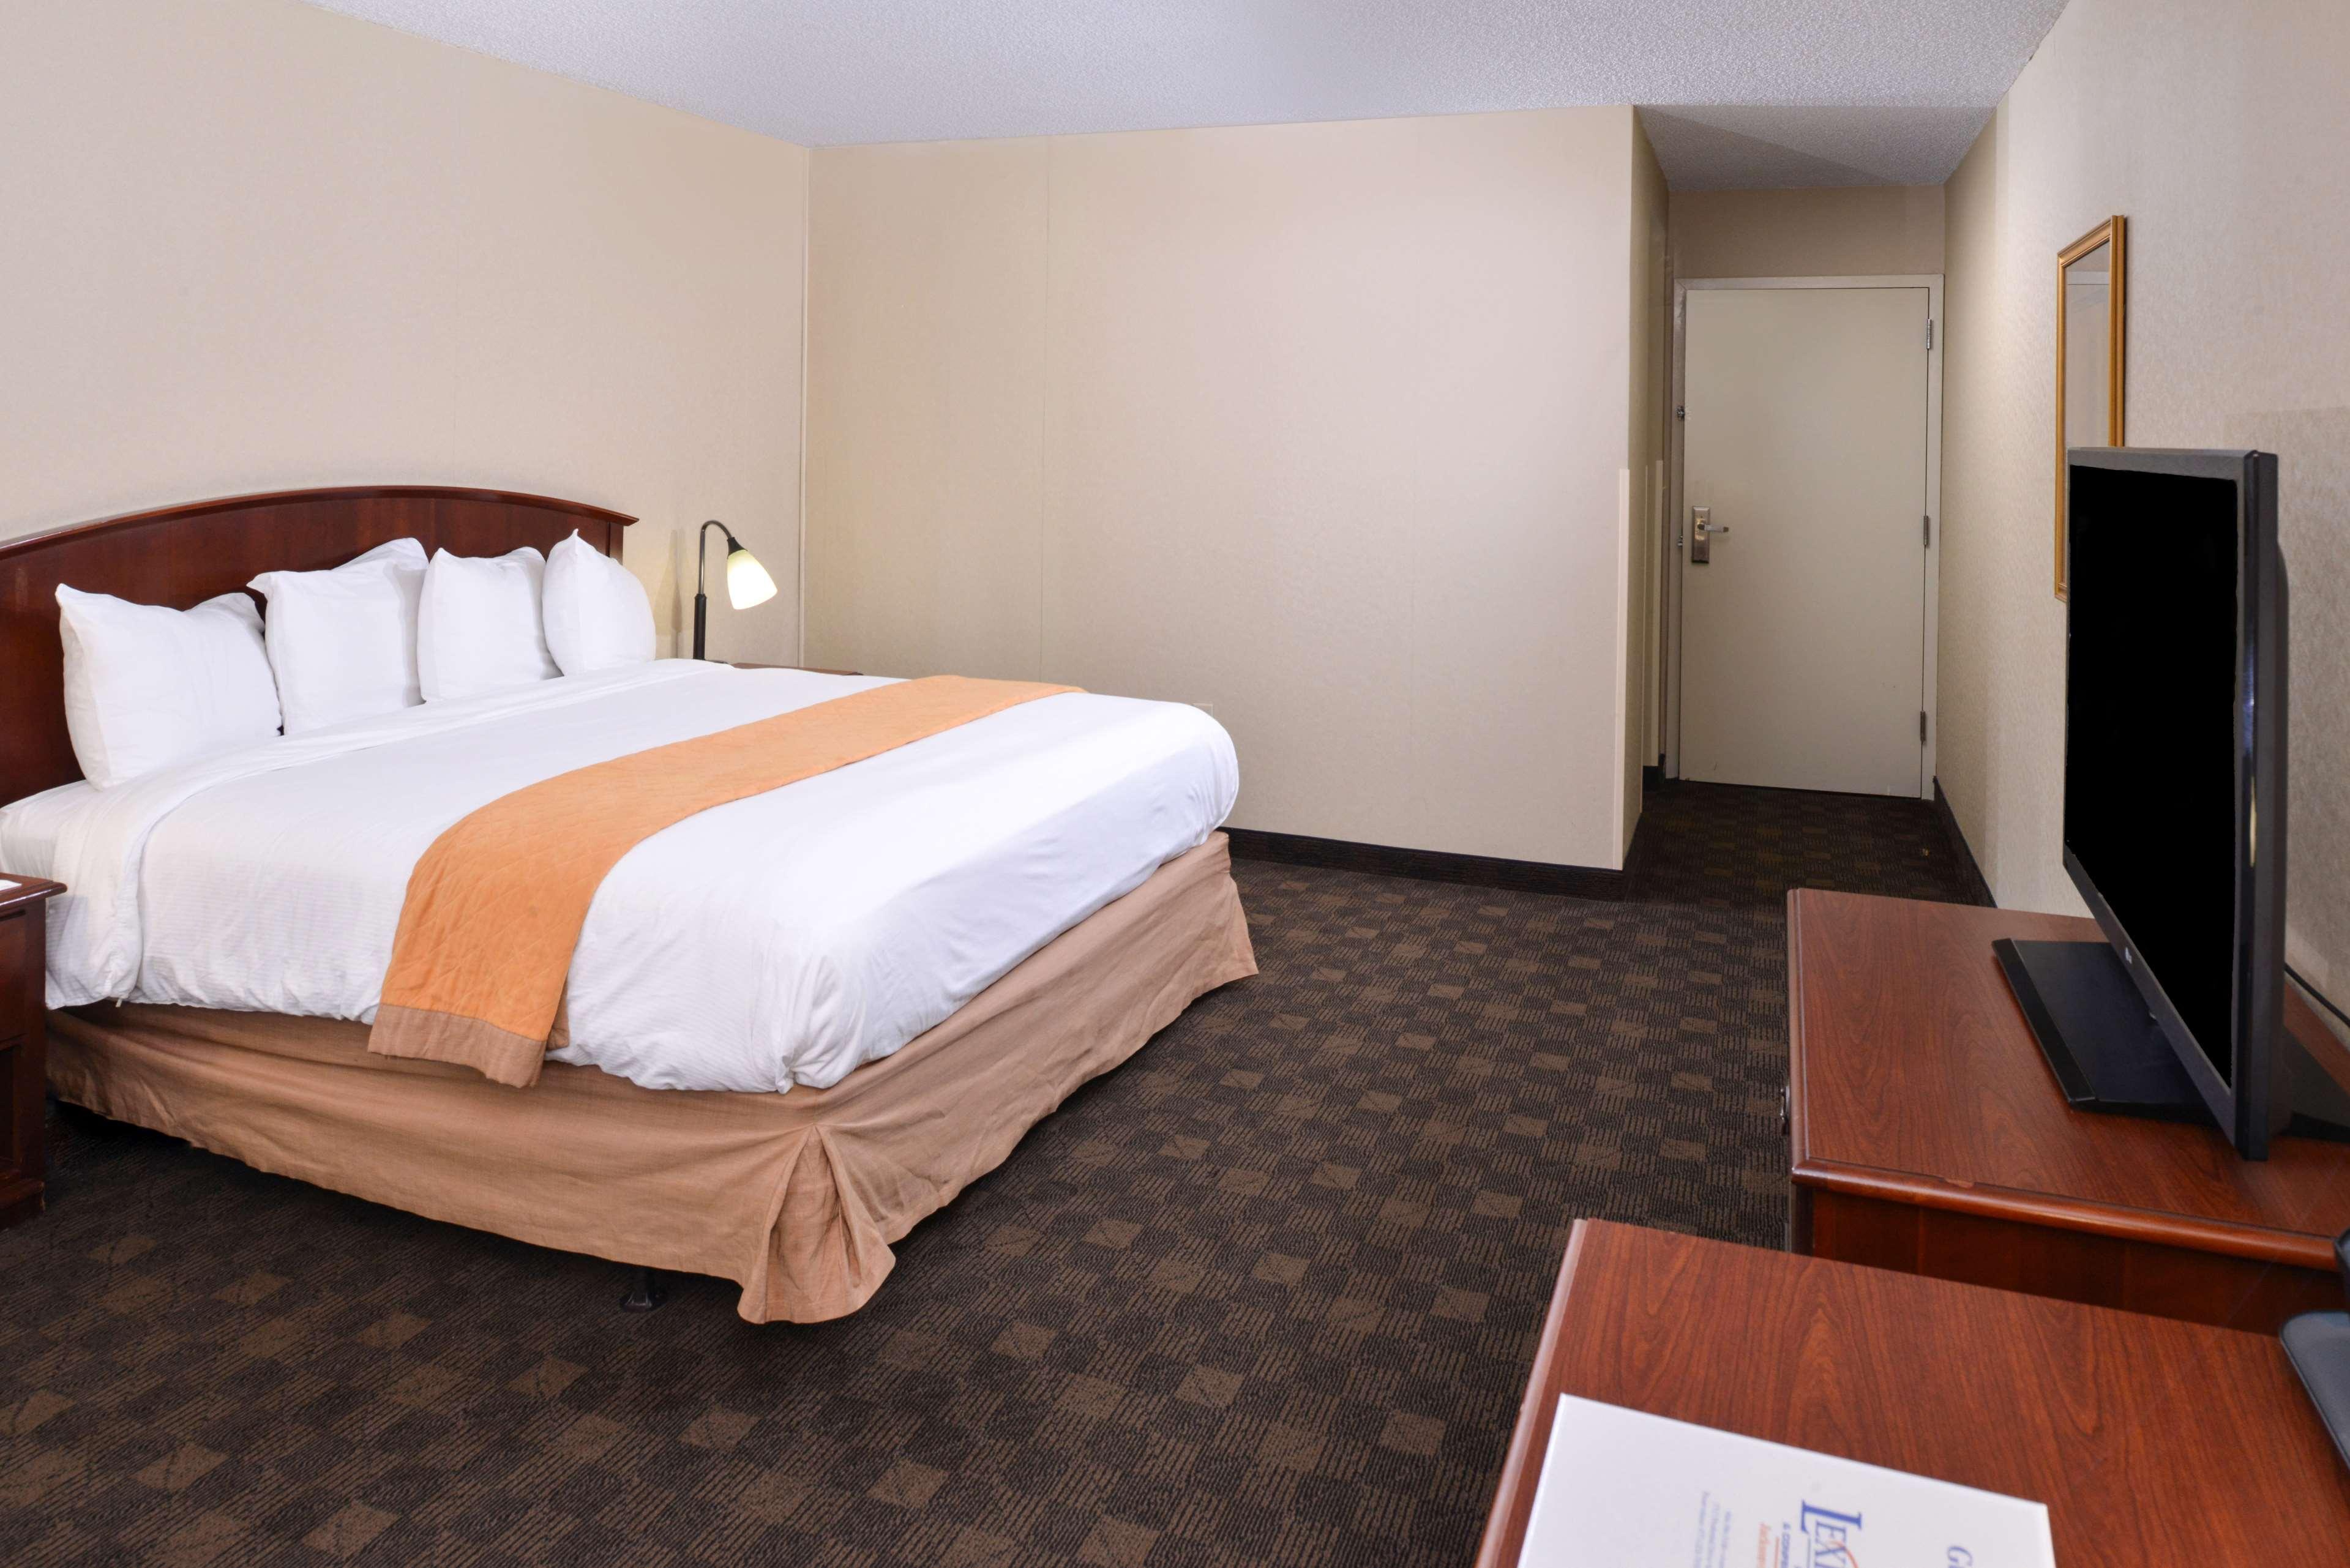 Shakir Economy Motel Jacksonville Fl